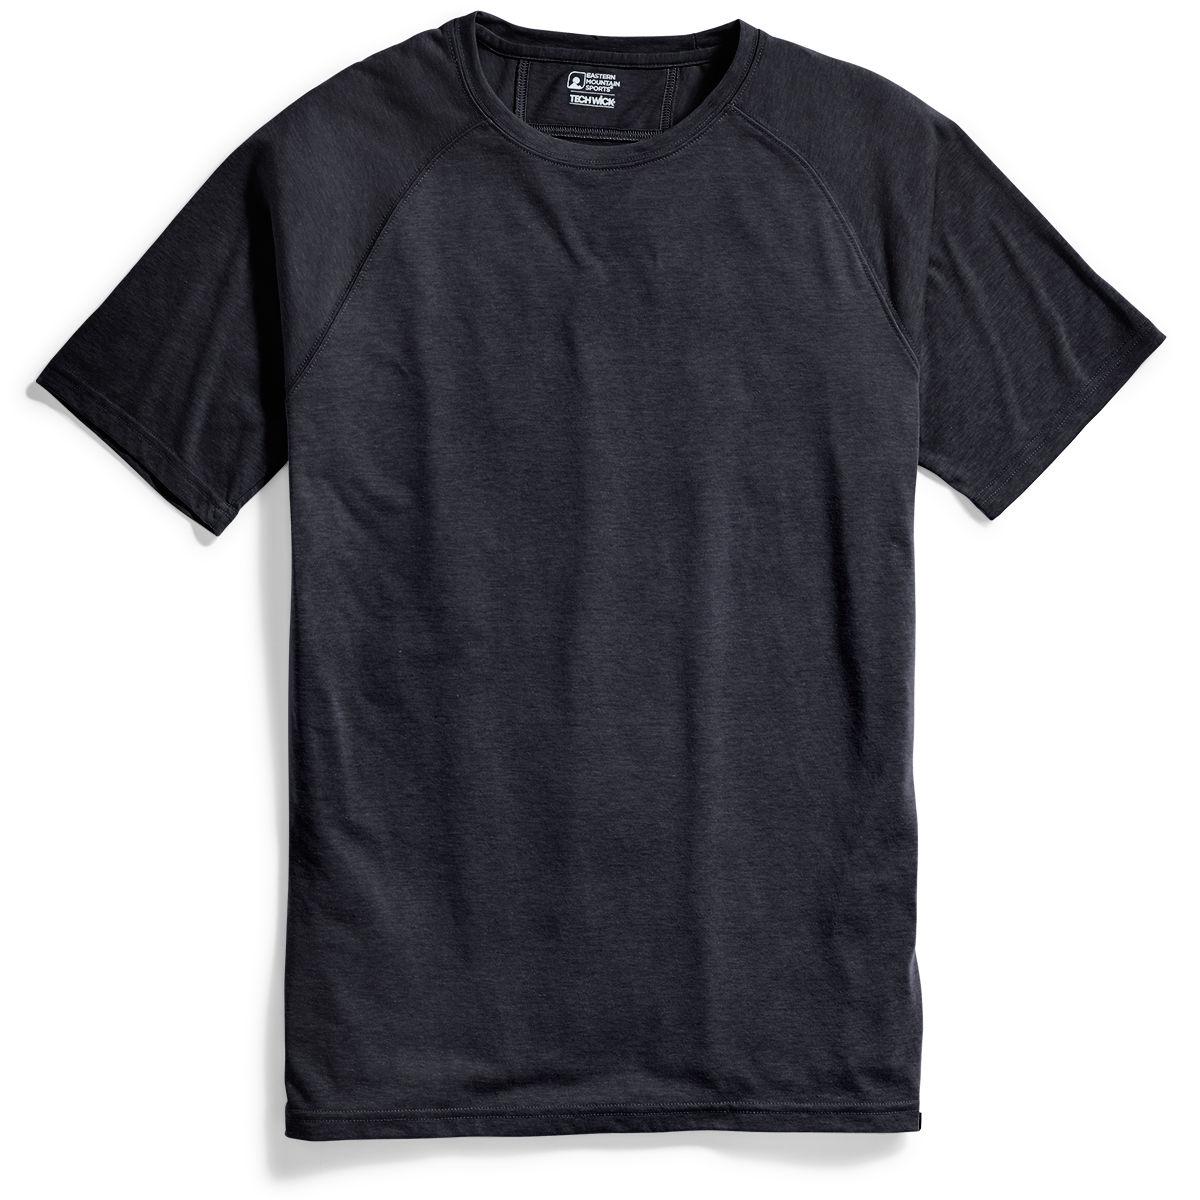 Emsa(R) Men's Techwicka(R) Vital Discovery Short-Sleeve Tee - Black, M